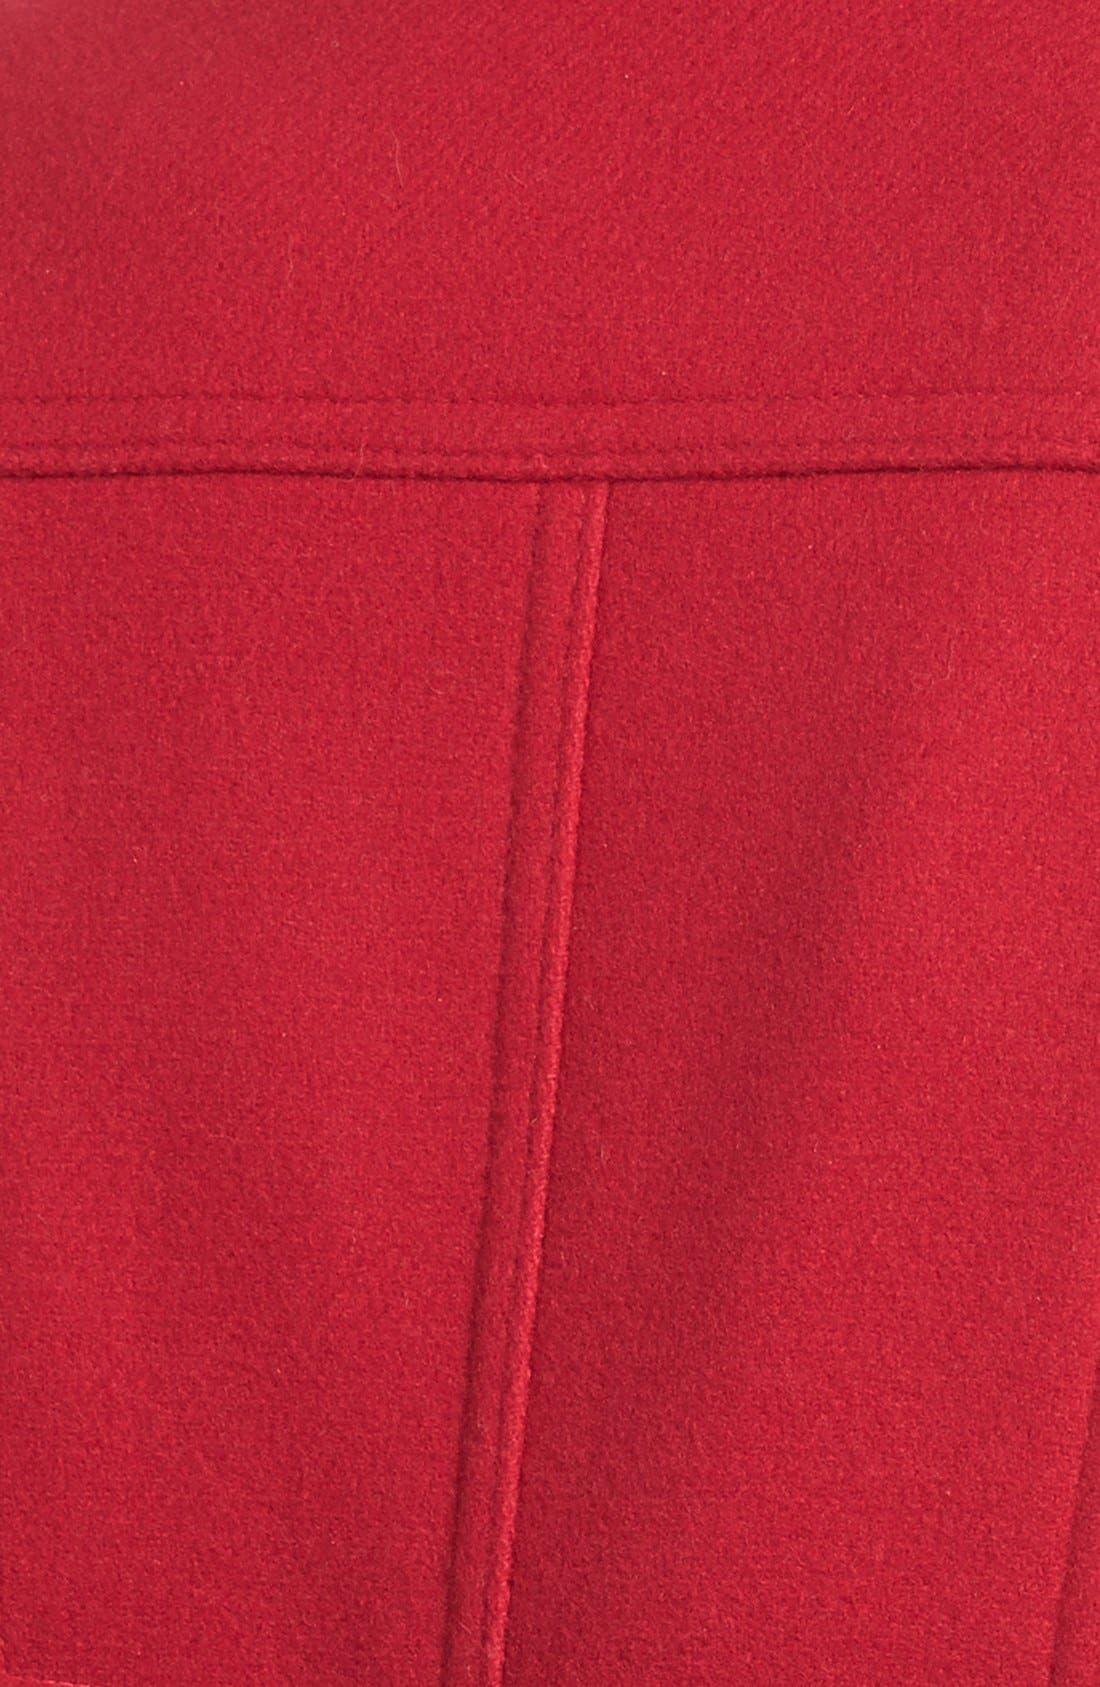 Wool Blend Peacoat,                             Alternate thumbnail 9, color,